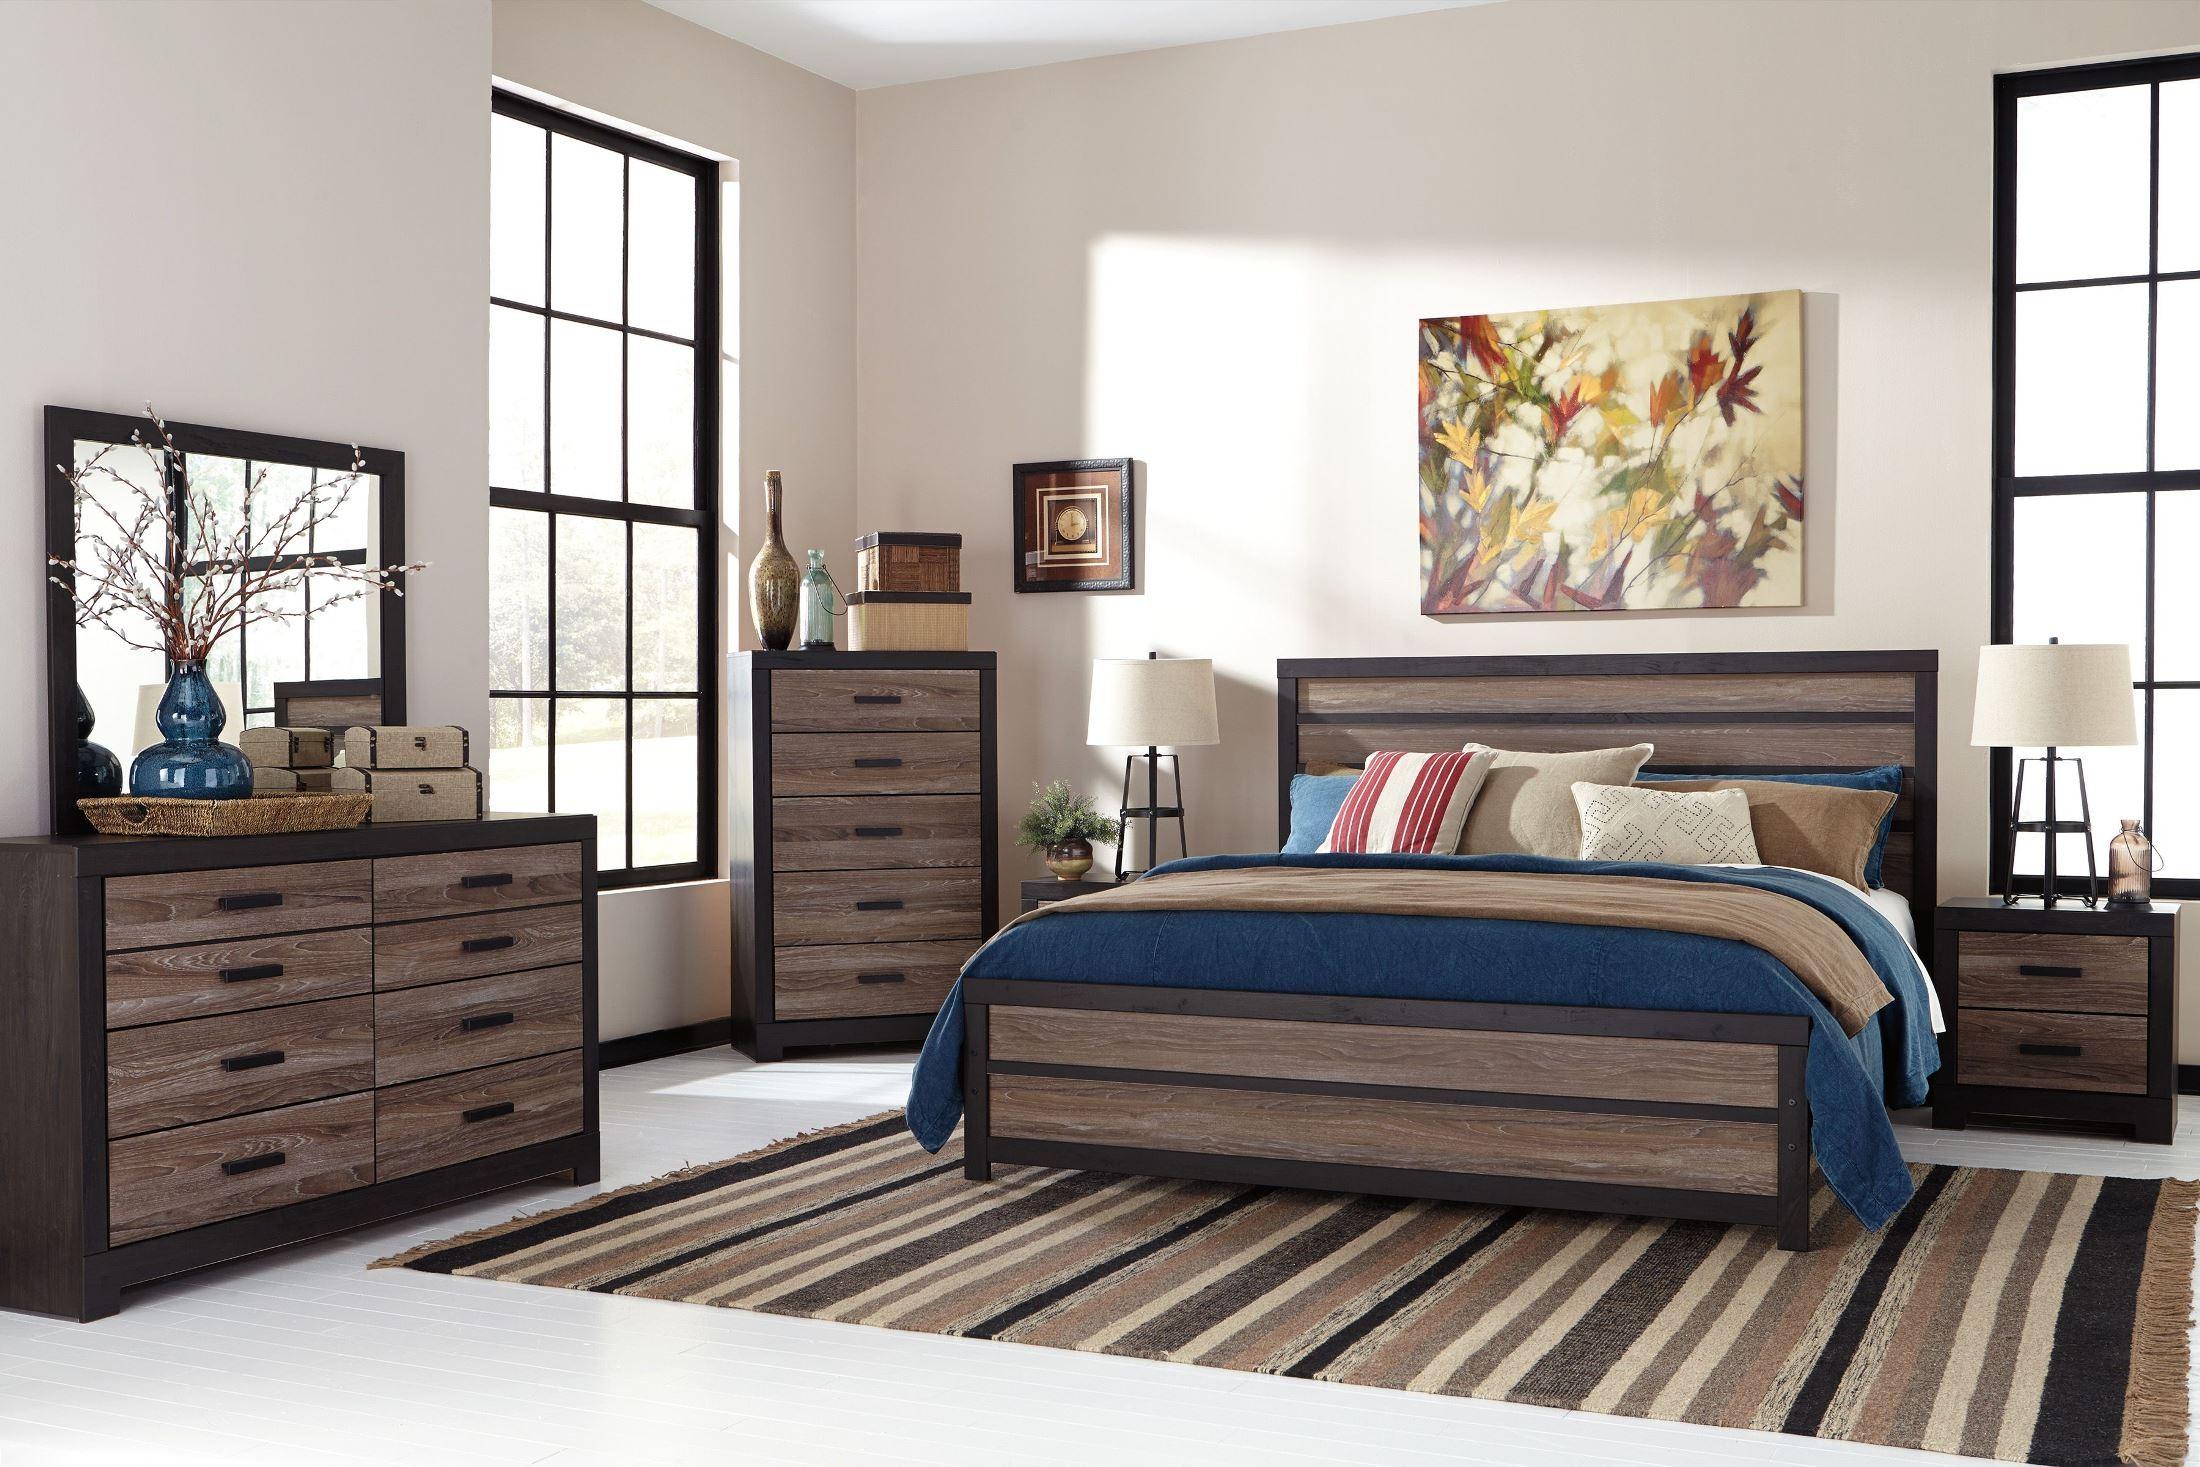 Harlinton Panel Bedroom Set From Ashley B325 57 54 96